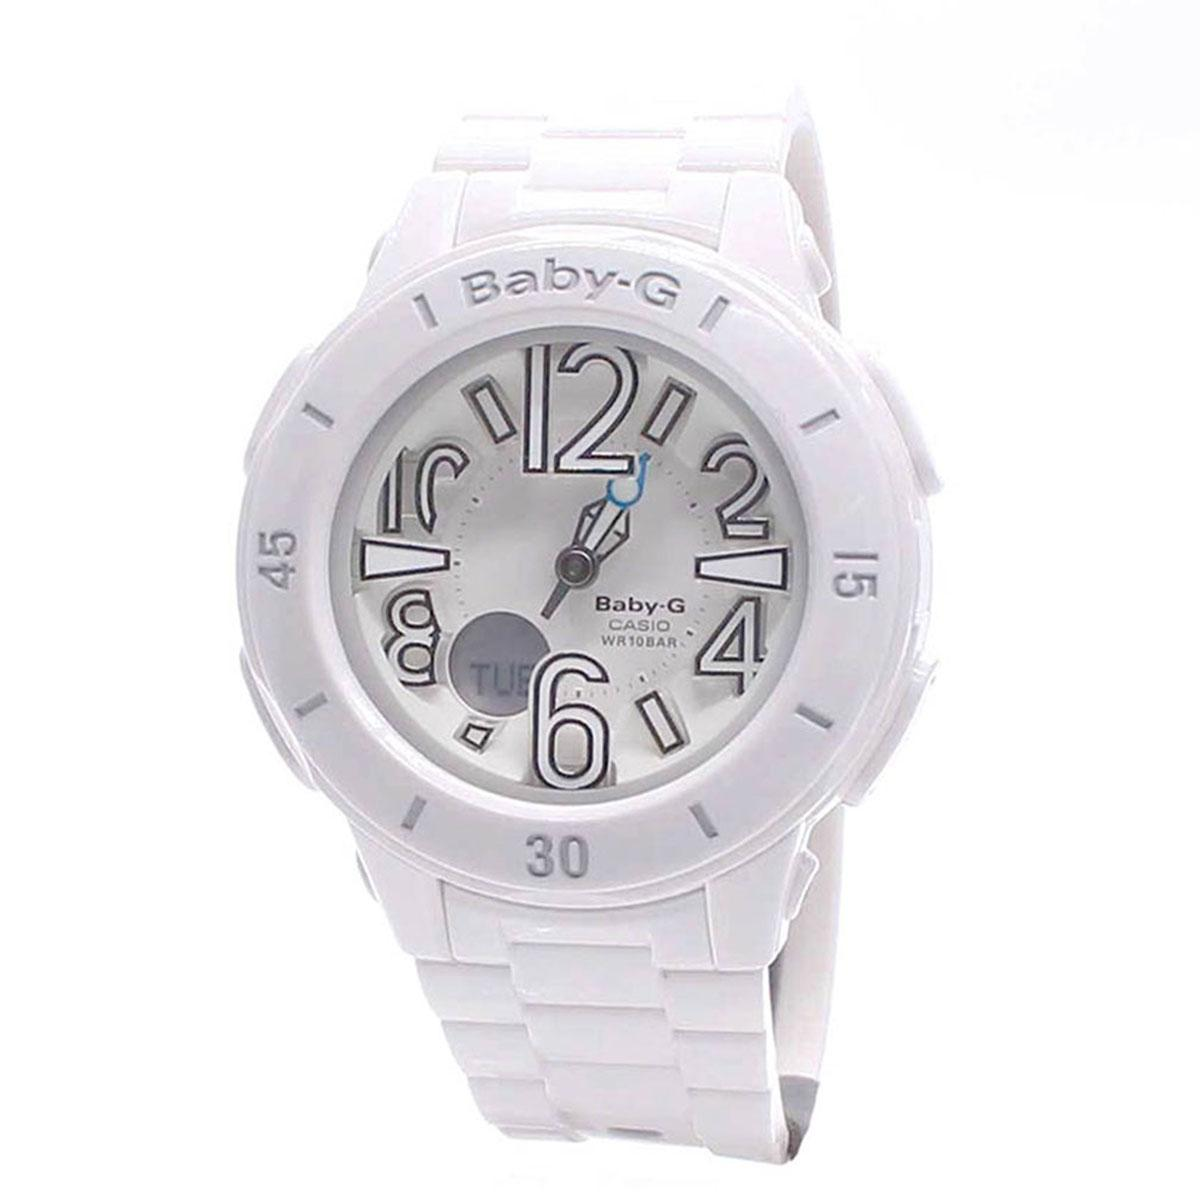 Casio Watch Baby G Neon Illuminator White Resin Case Resin Strap Ladies Bga 170 7B1 Promo Code